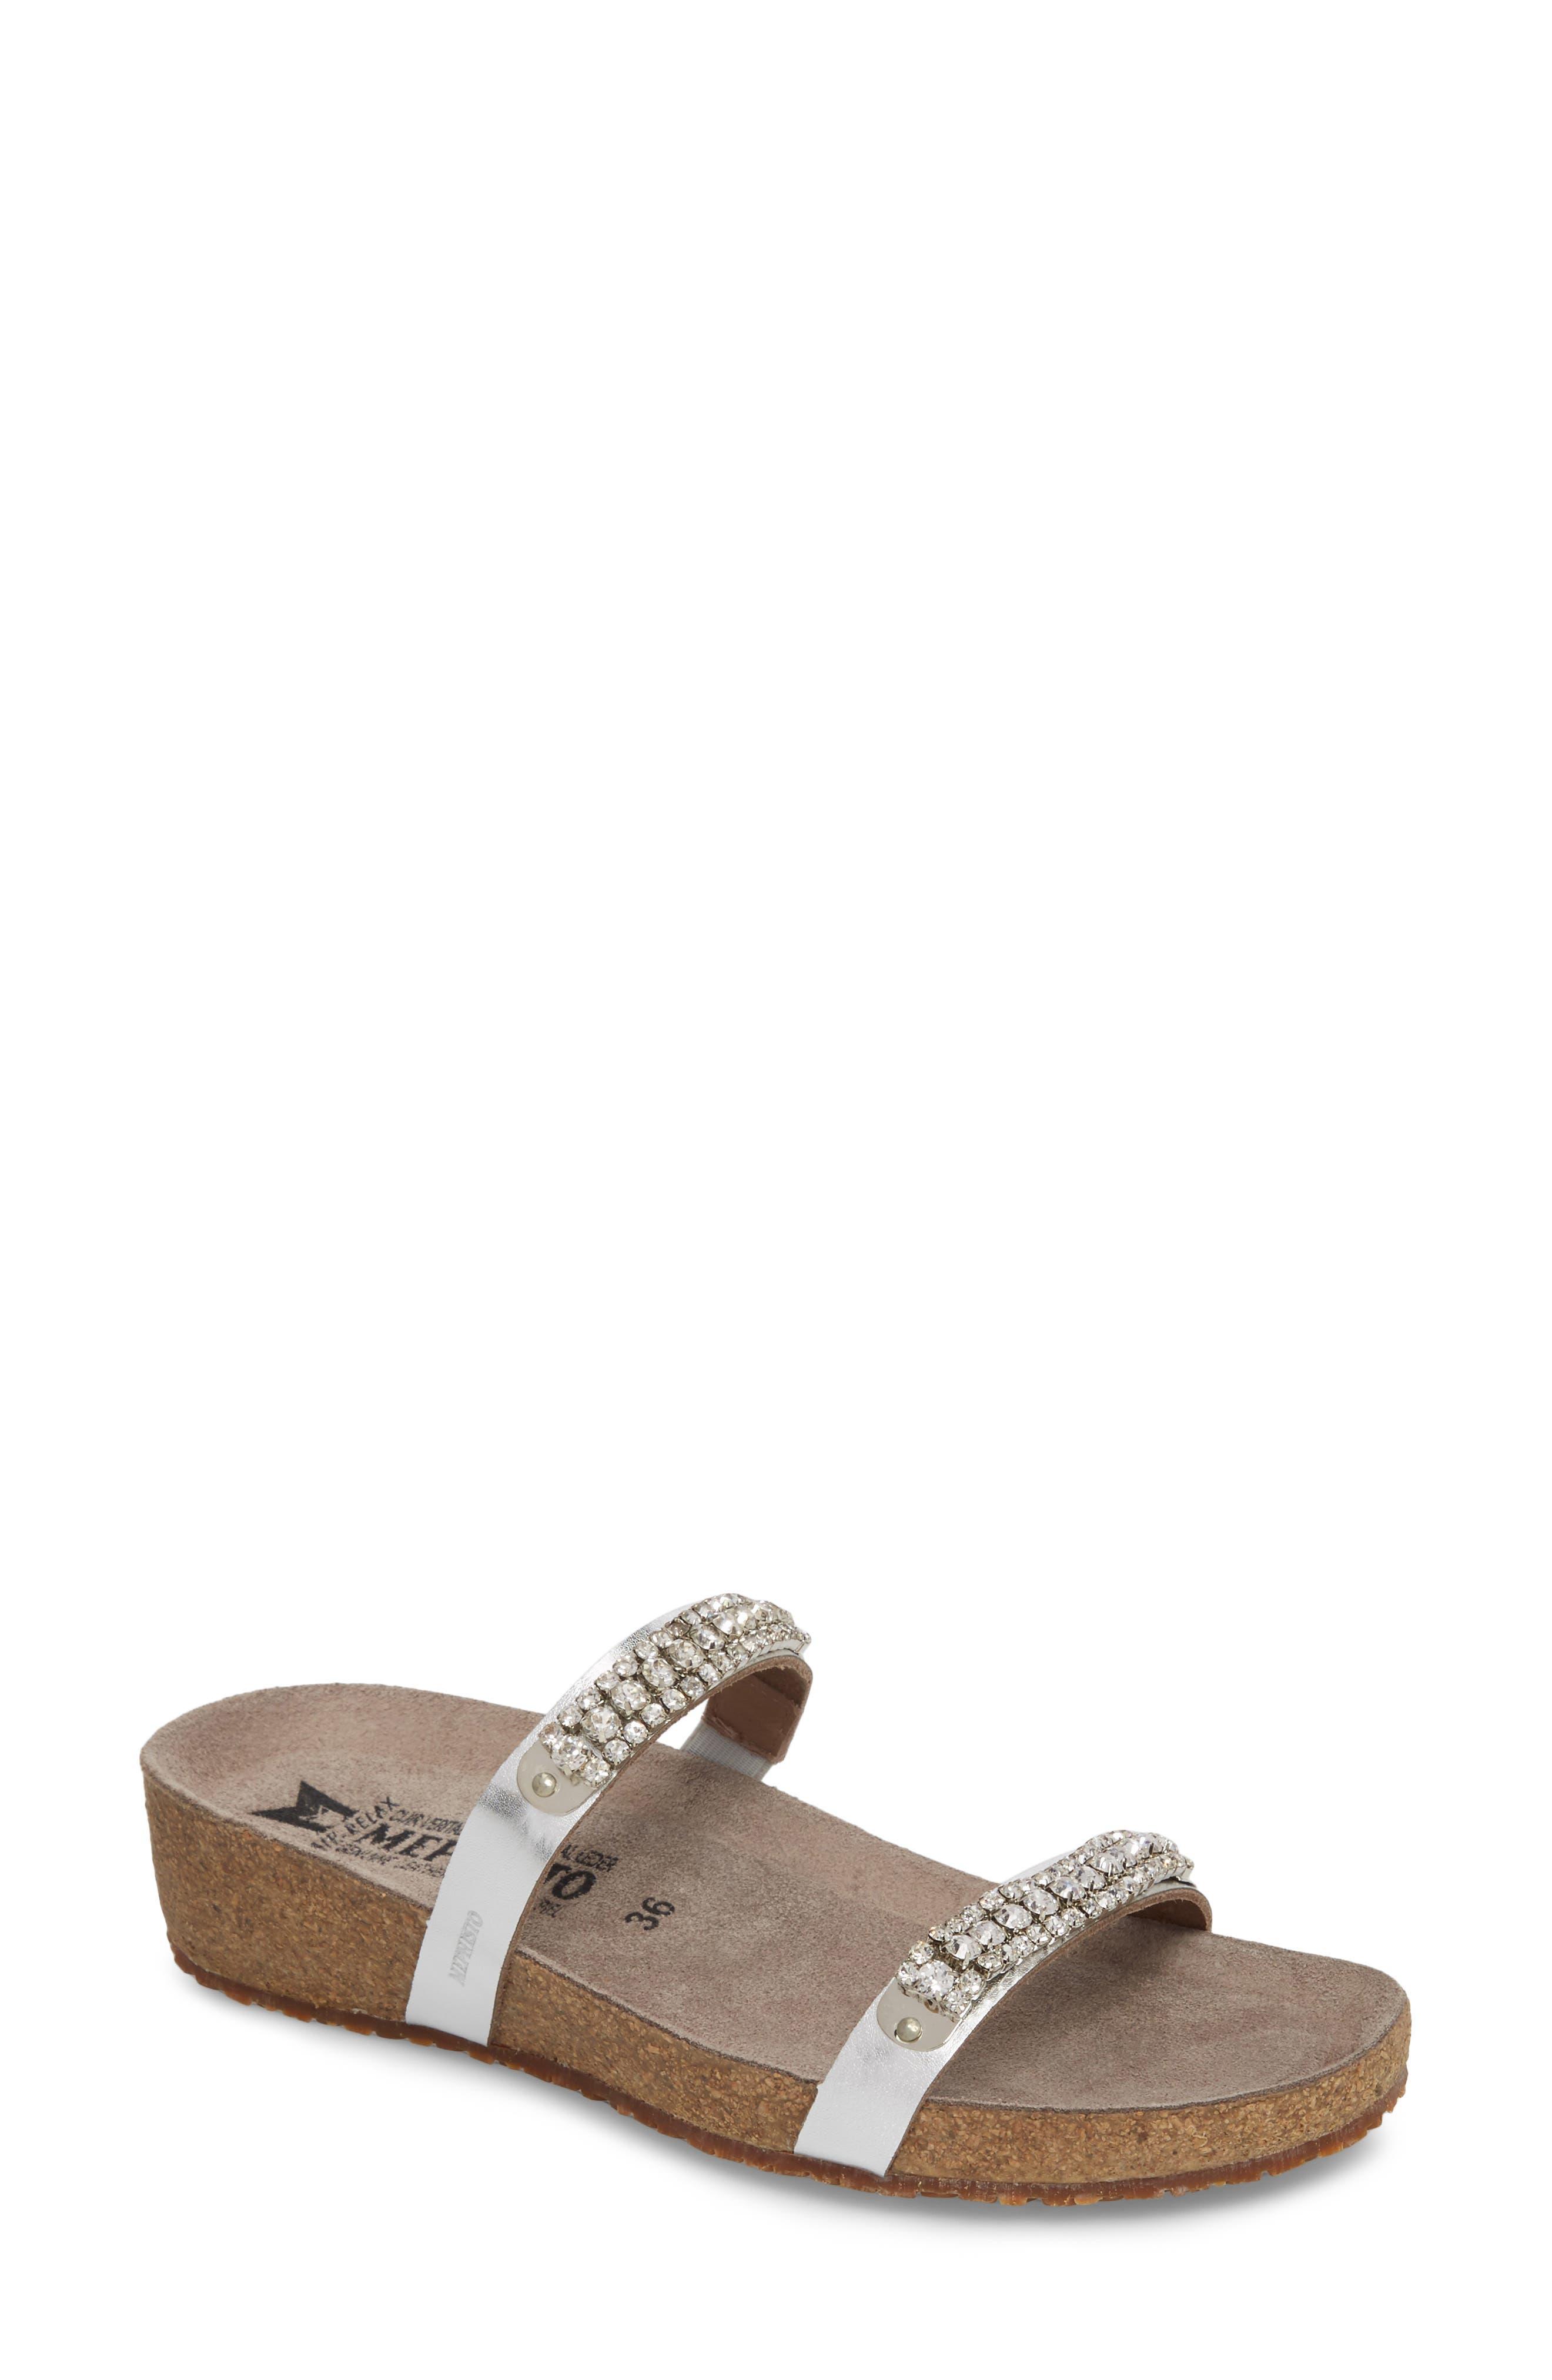 MEPHISTO, 'Ivana' Crystal Embellished Slide Sandal, Main thumbnail 1, color, NICKEL LEATHER